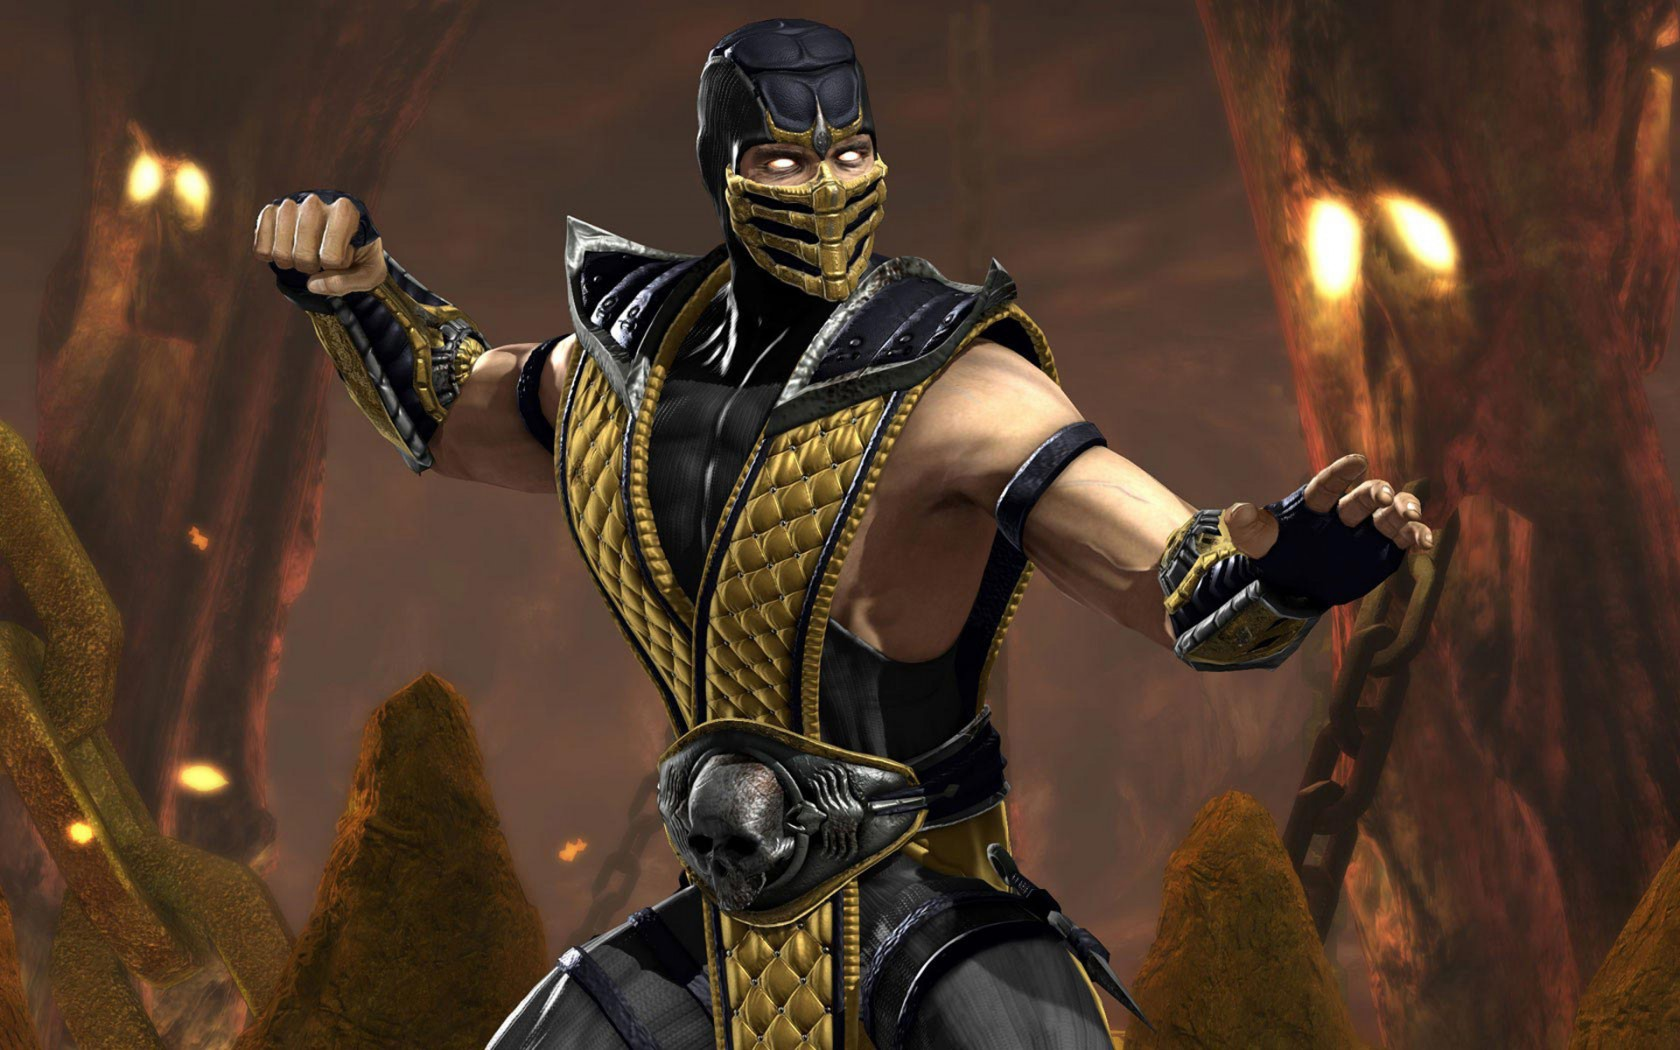 mortal kombat wallpaper scorpion 4 » mortal kombat games, fan site!